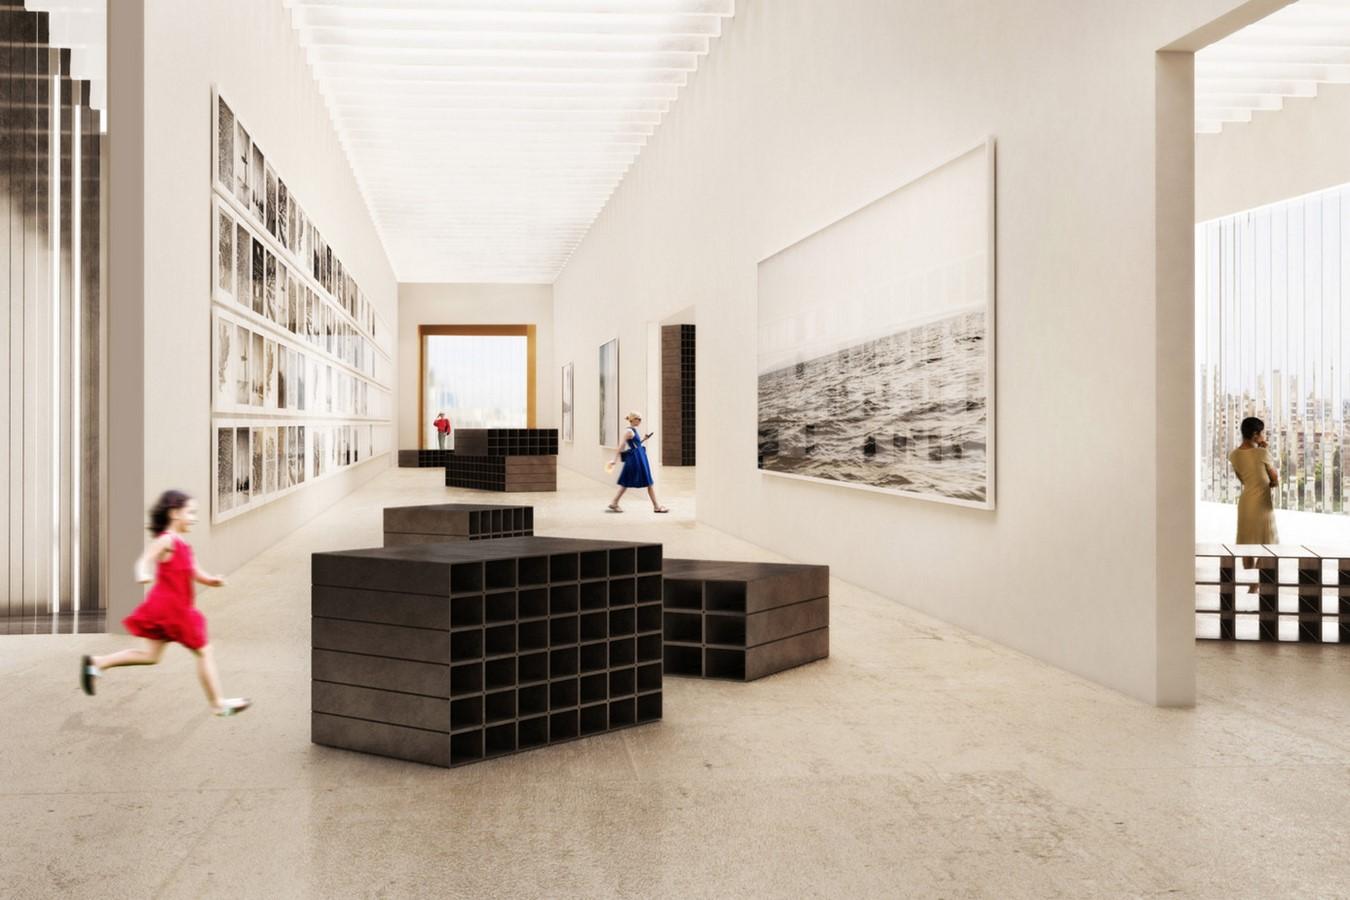 BeMA: Beirut Museum of Art by Lina Ghotmeh: The Urban Theatre - Sheet11